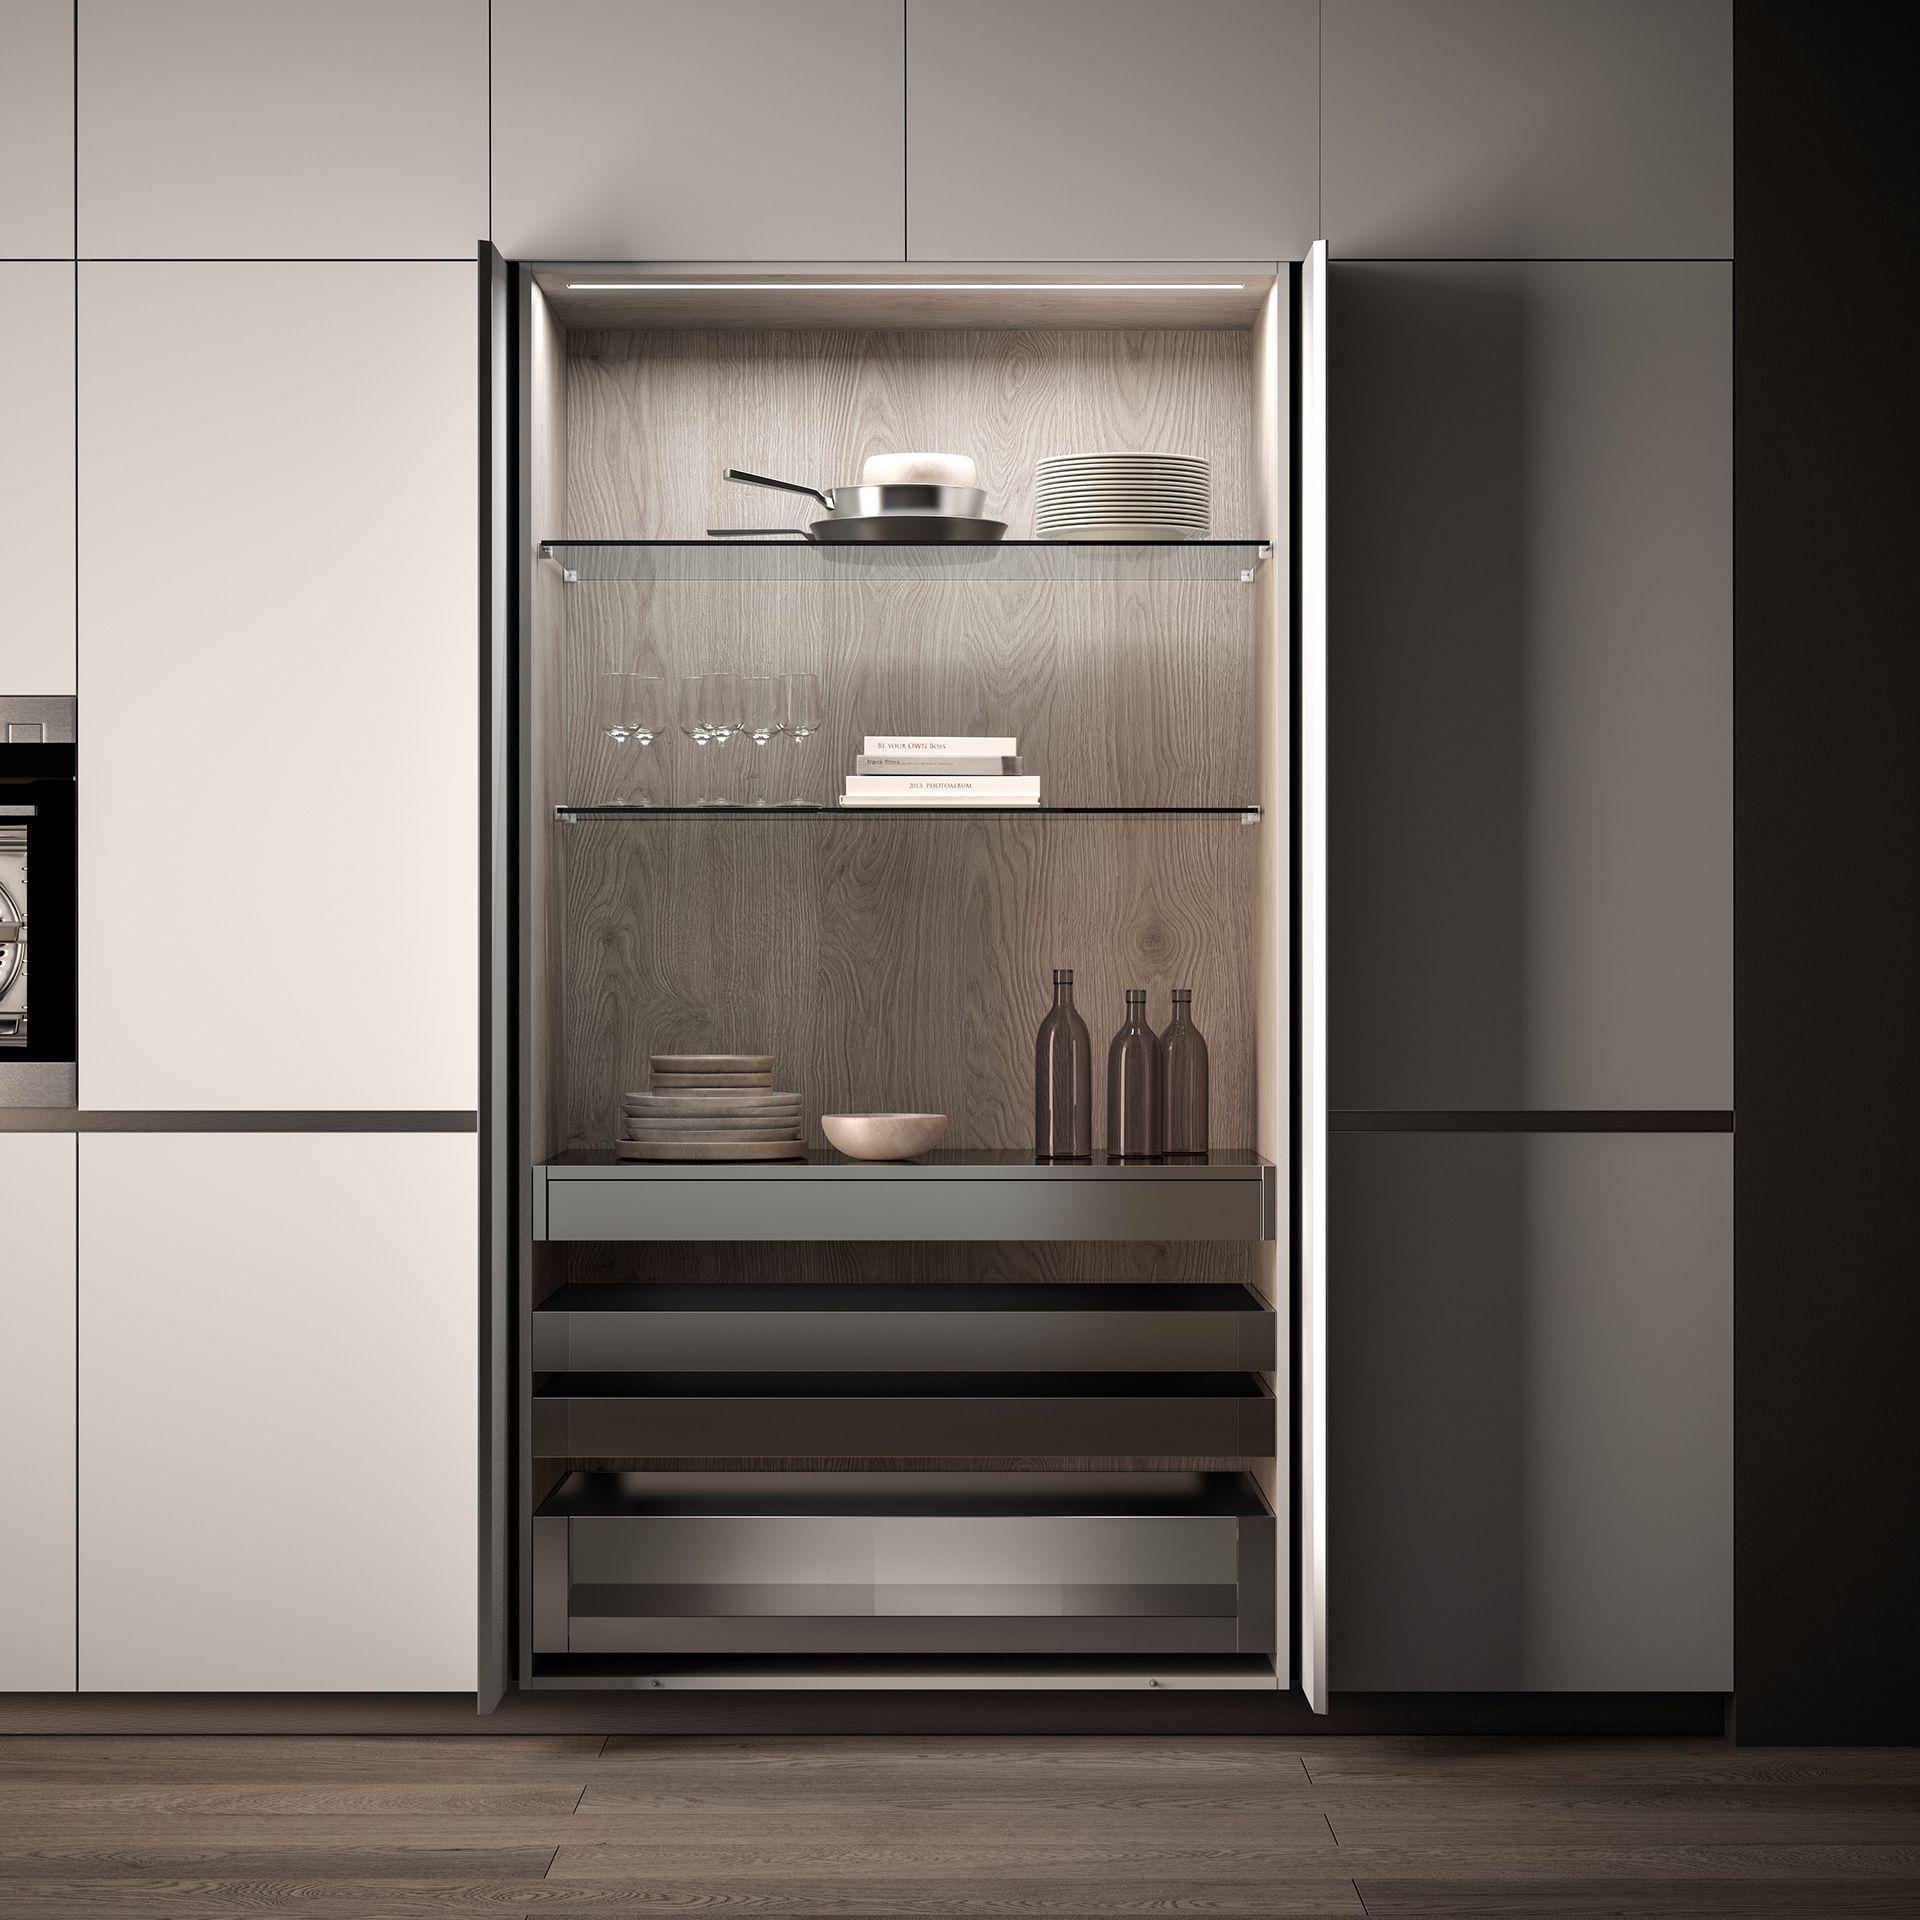 Ikea Kitchen Cabinet Refacing: Effeti Kitchen 2018 On Behance